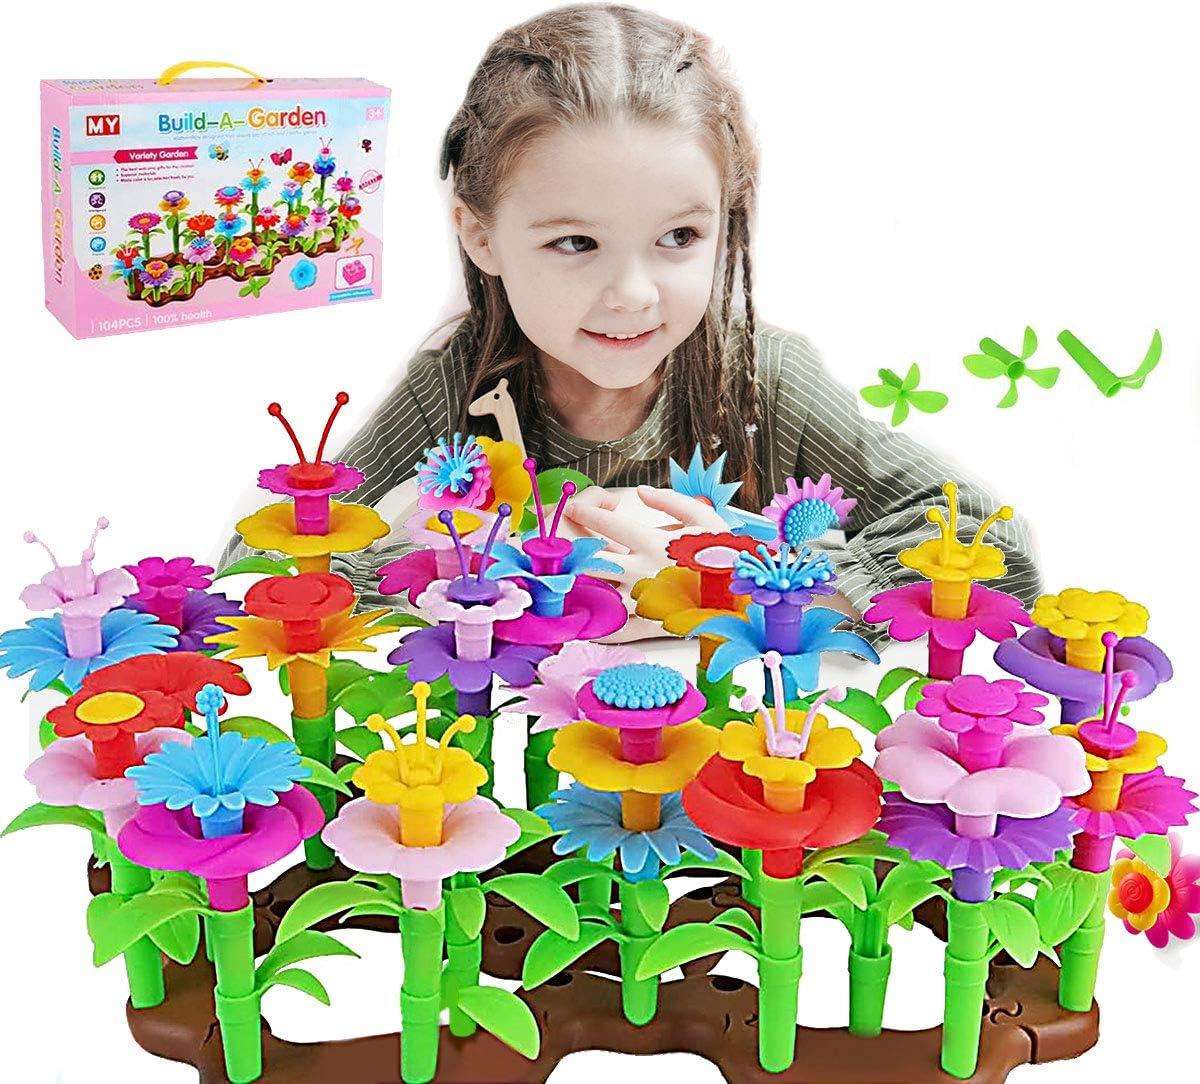 Flower Garden Building Toys, STEM Build a Bouquet Floral Arrangement Playset for Toddlers Kids Age 3, 4, 5, 6 Year Old, 104 PCS Garden Building Block Toys, Educational Creative Play Garden Stem Toys